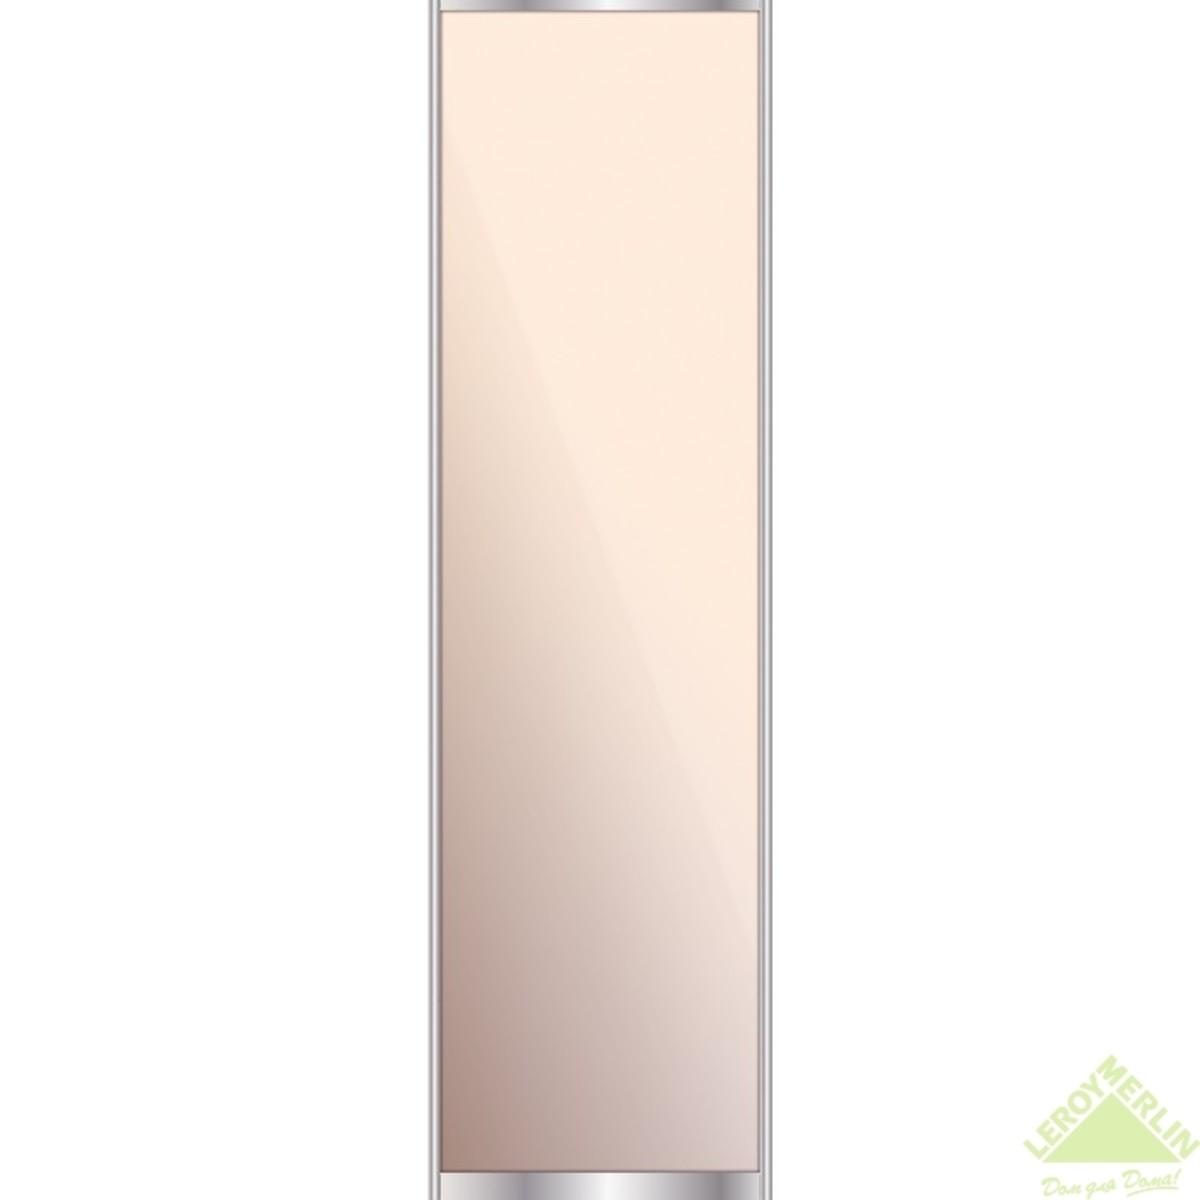 Дверь-купе 2251х804 мм зеркало цвет серебро